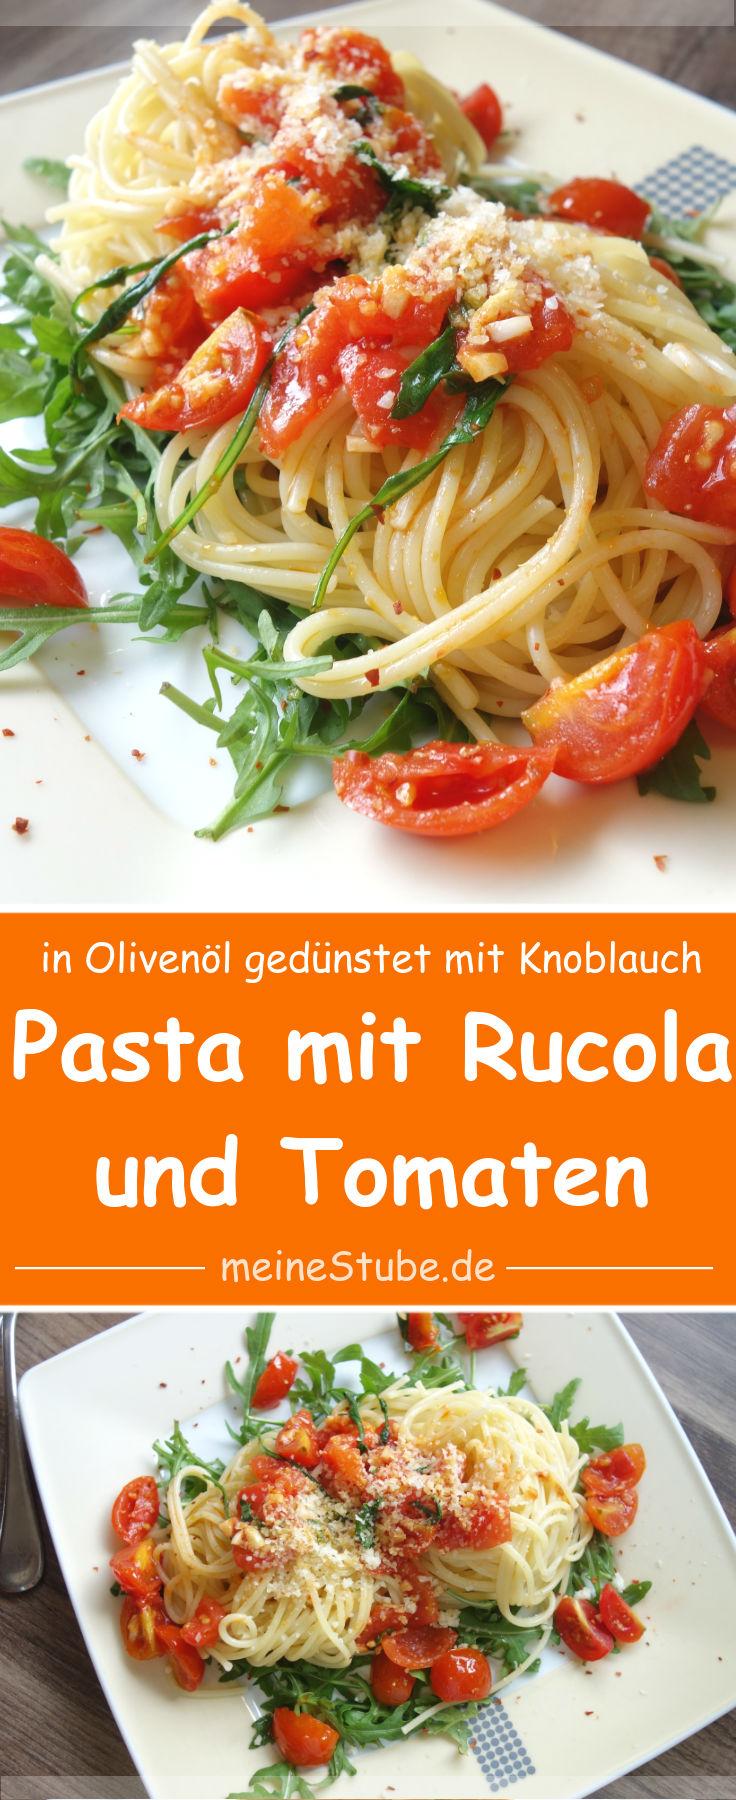 Pasta-rucola-tomaten-knoblauch.jpg